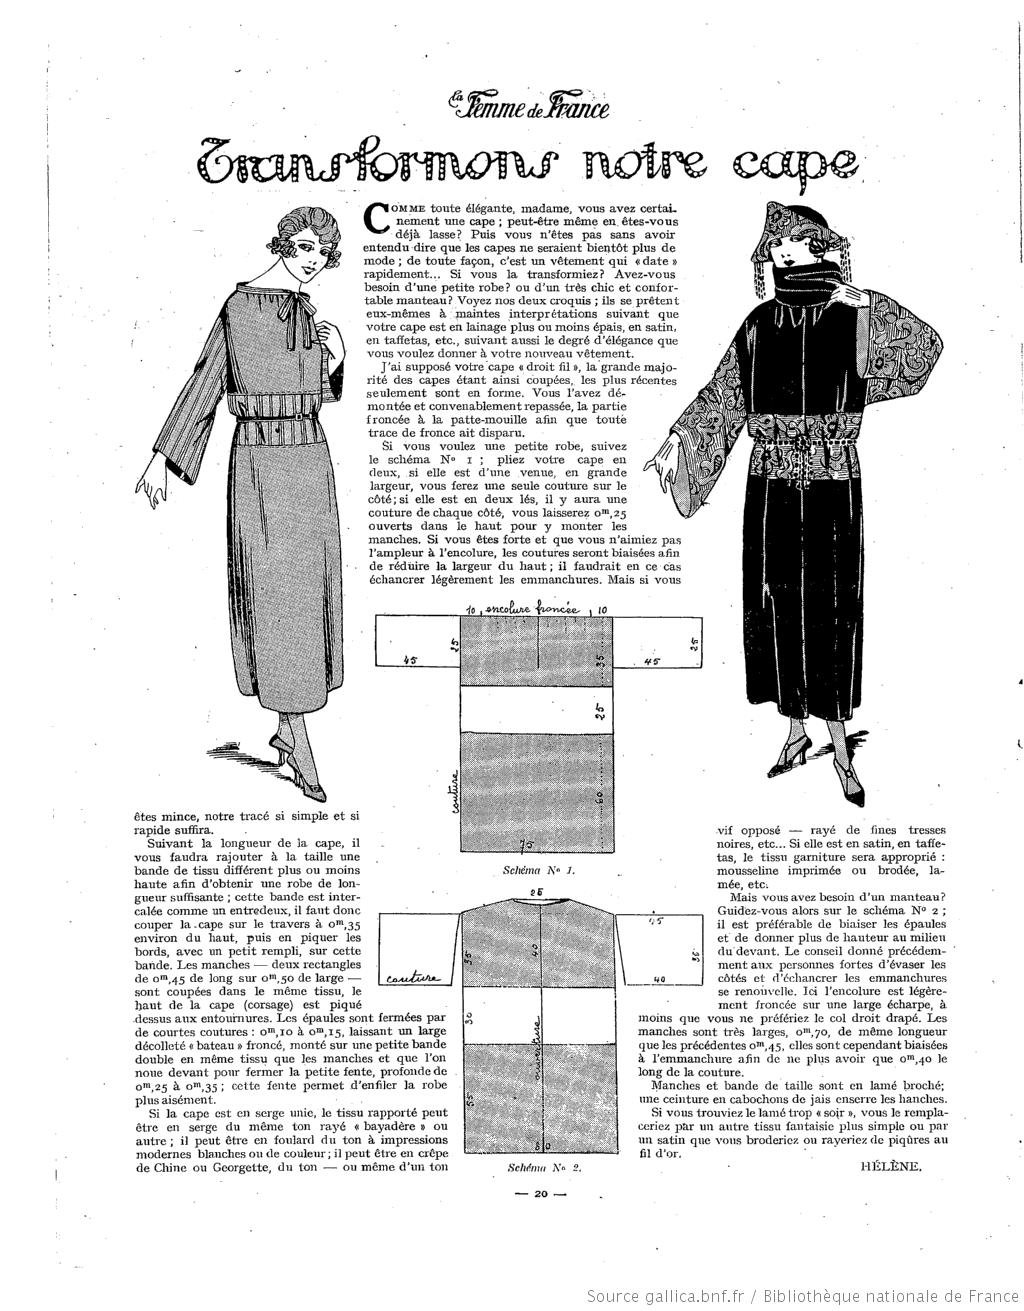 La Femme de France 1922/01/29   pattern systems   Pinterest